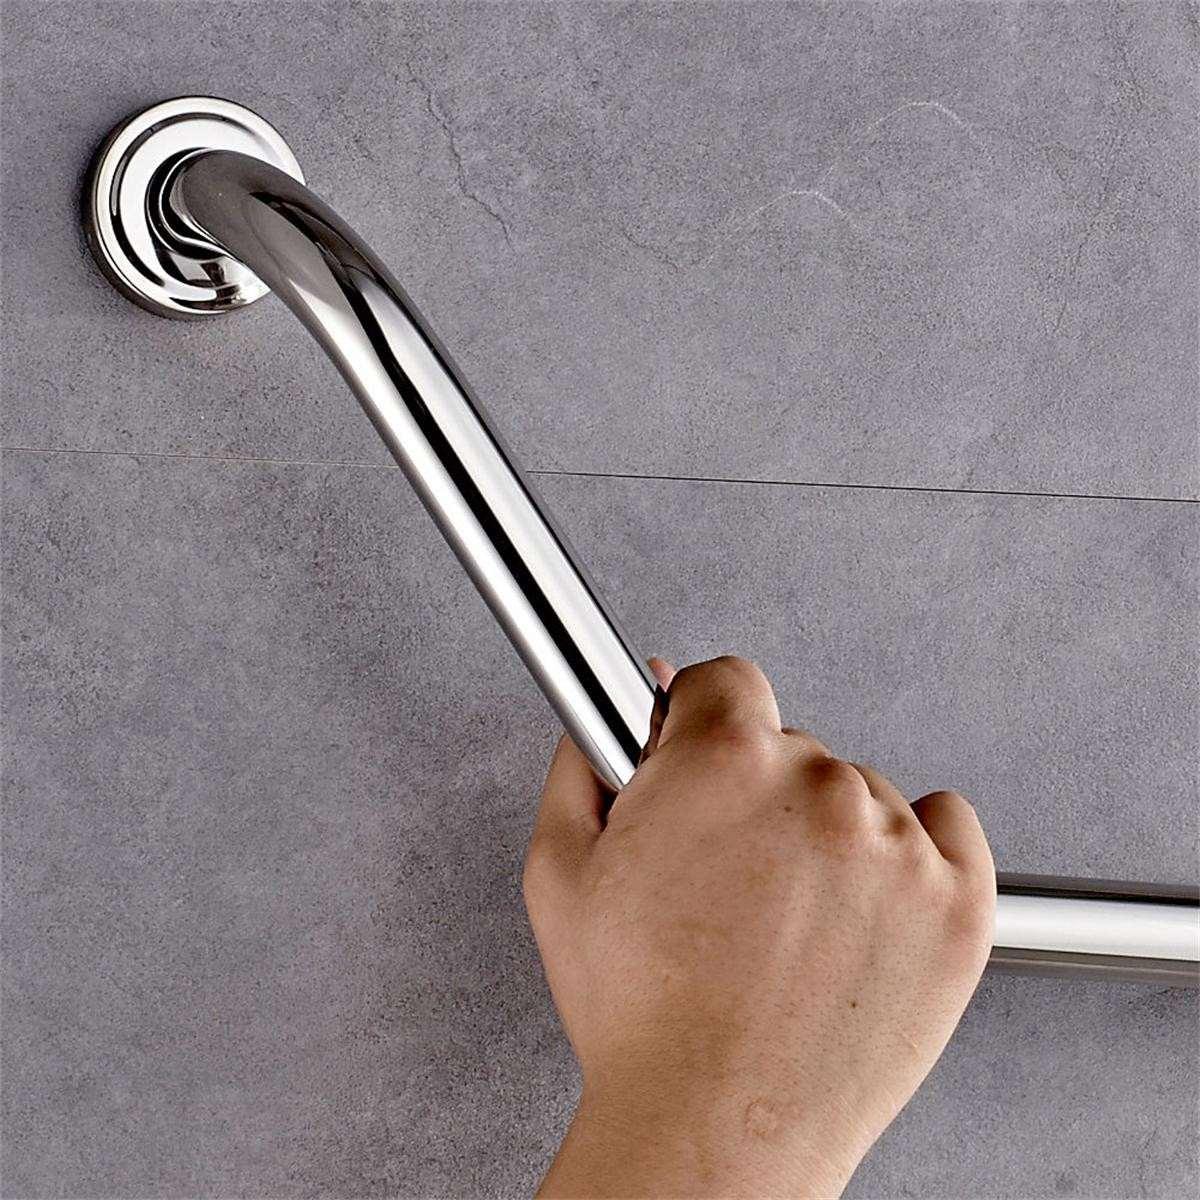 Wall Mount Stainless Steel Bathroom Bathtub Arm Safety Handle Grip ...